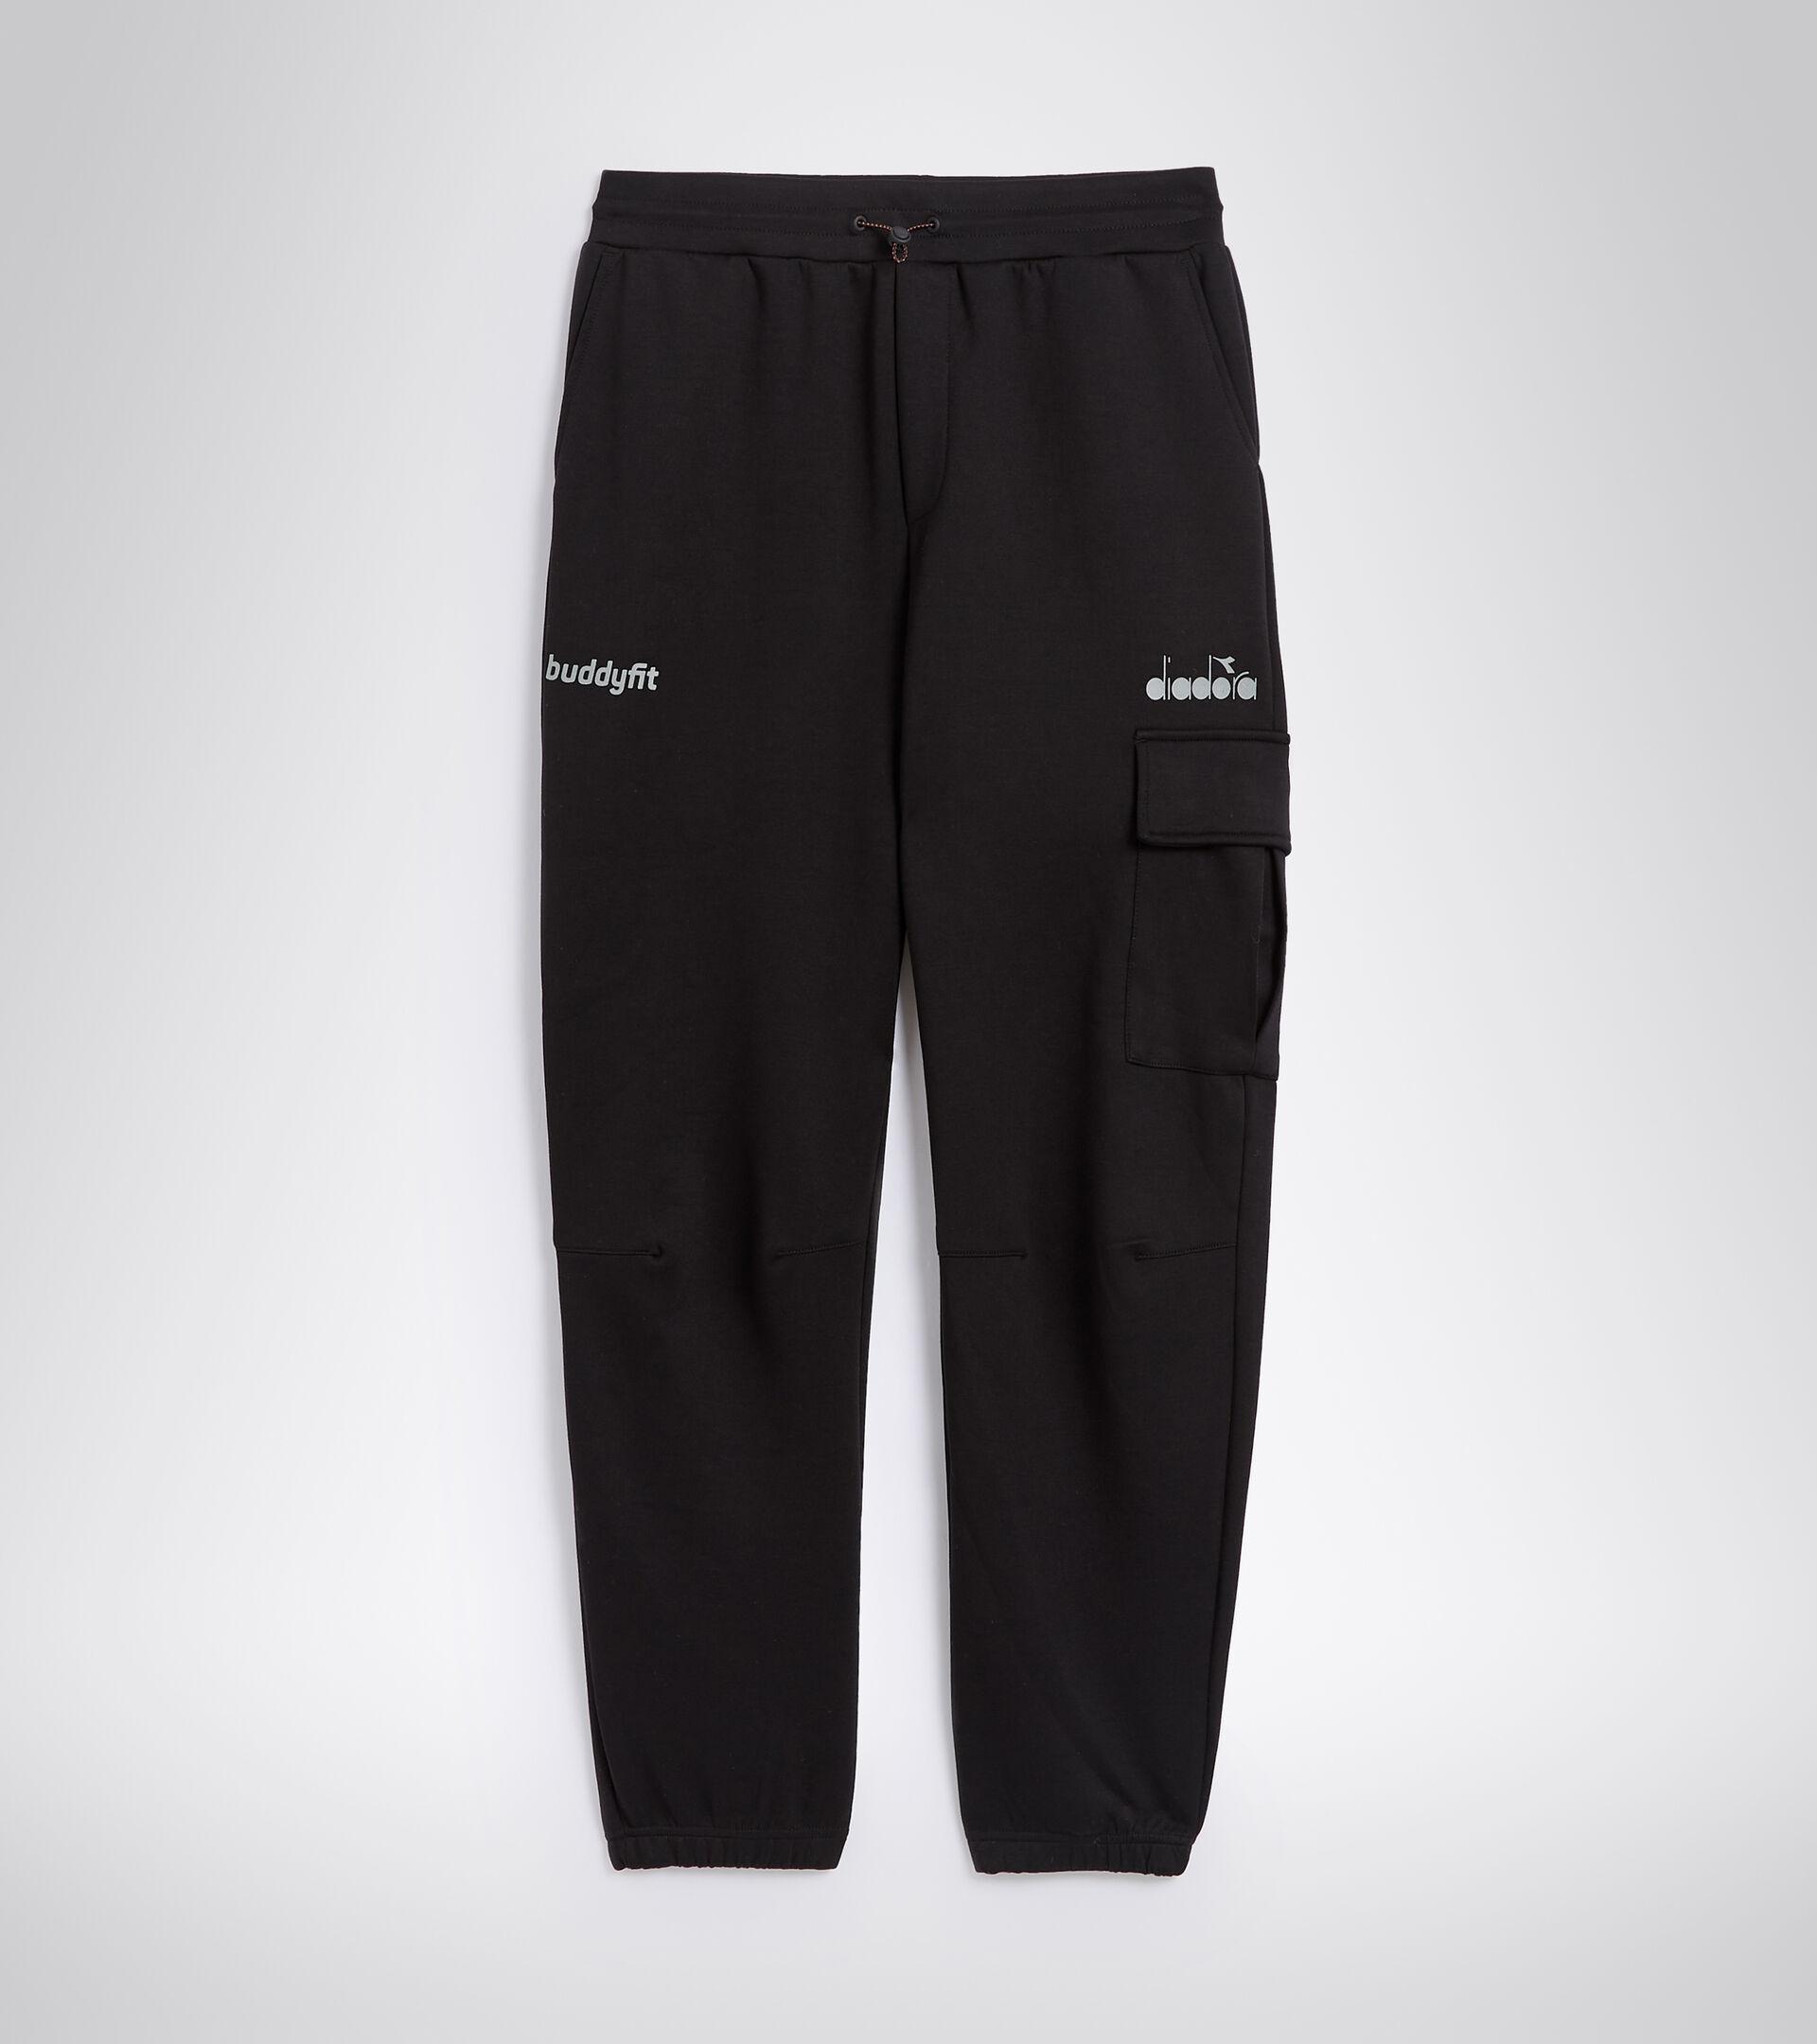 Sports trousers for men PANTS BUDDYFIT BLACK - Diadora